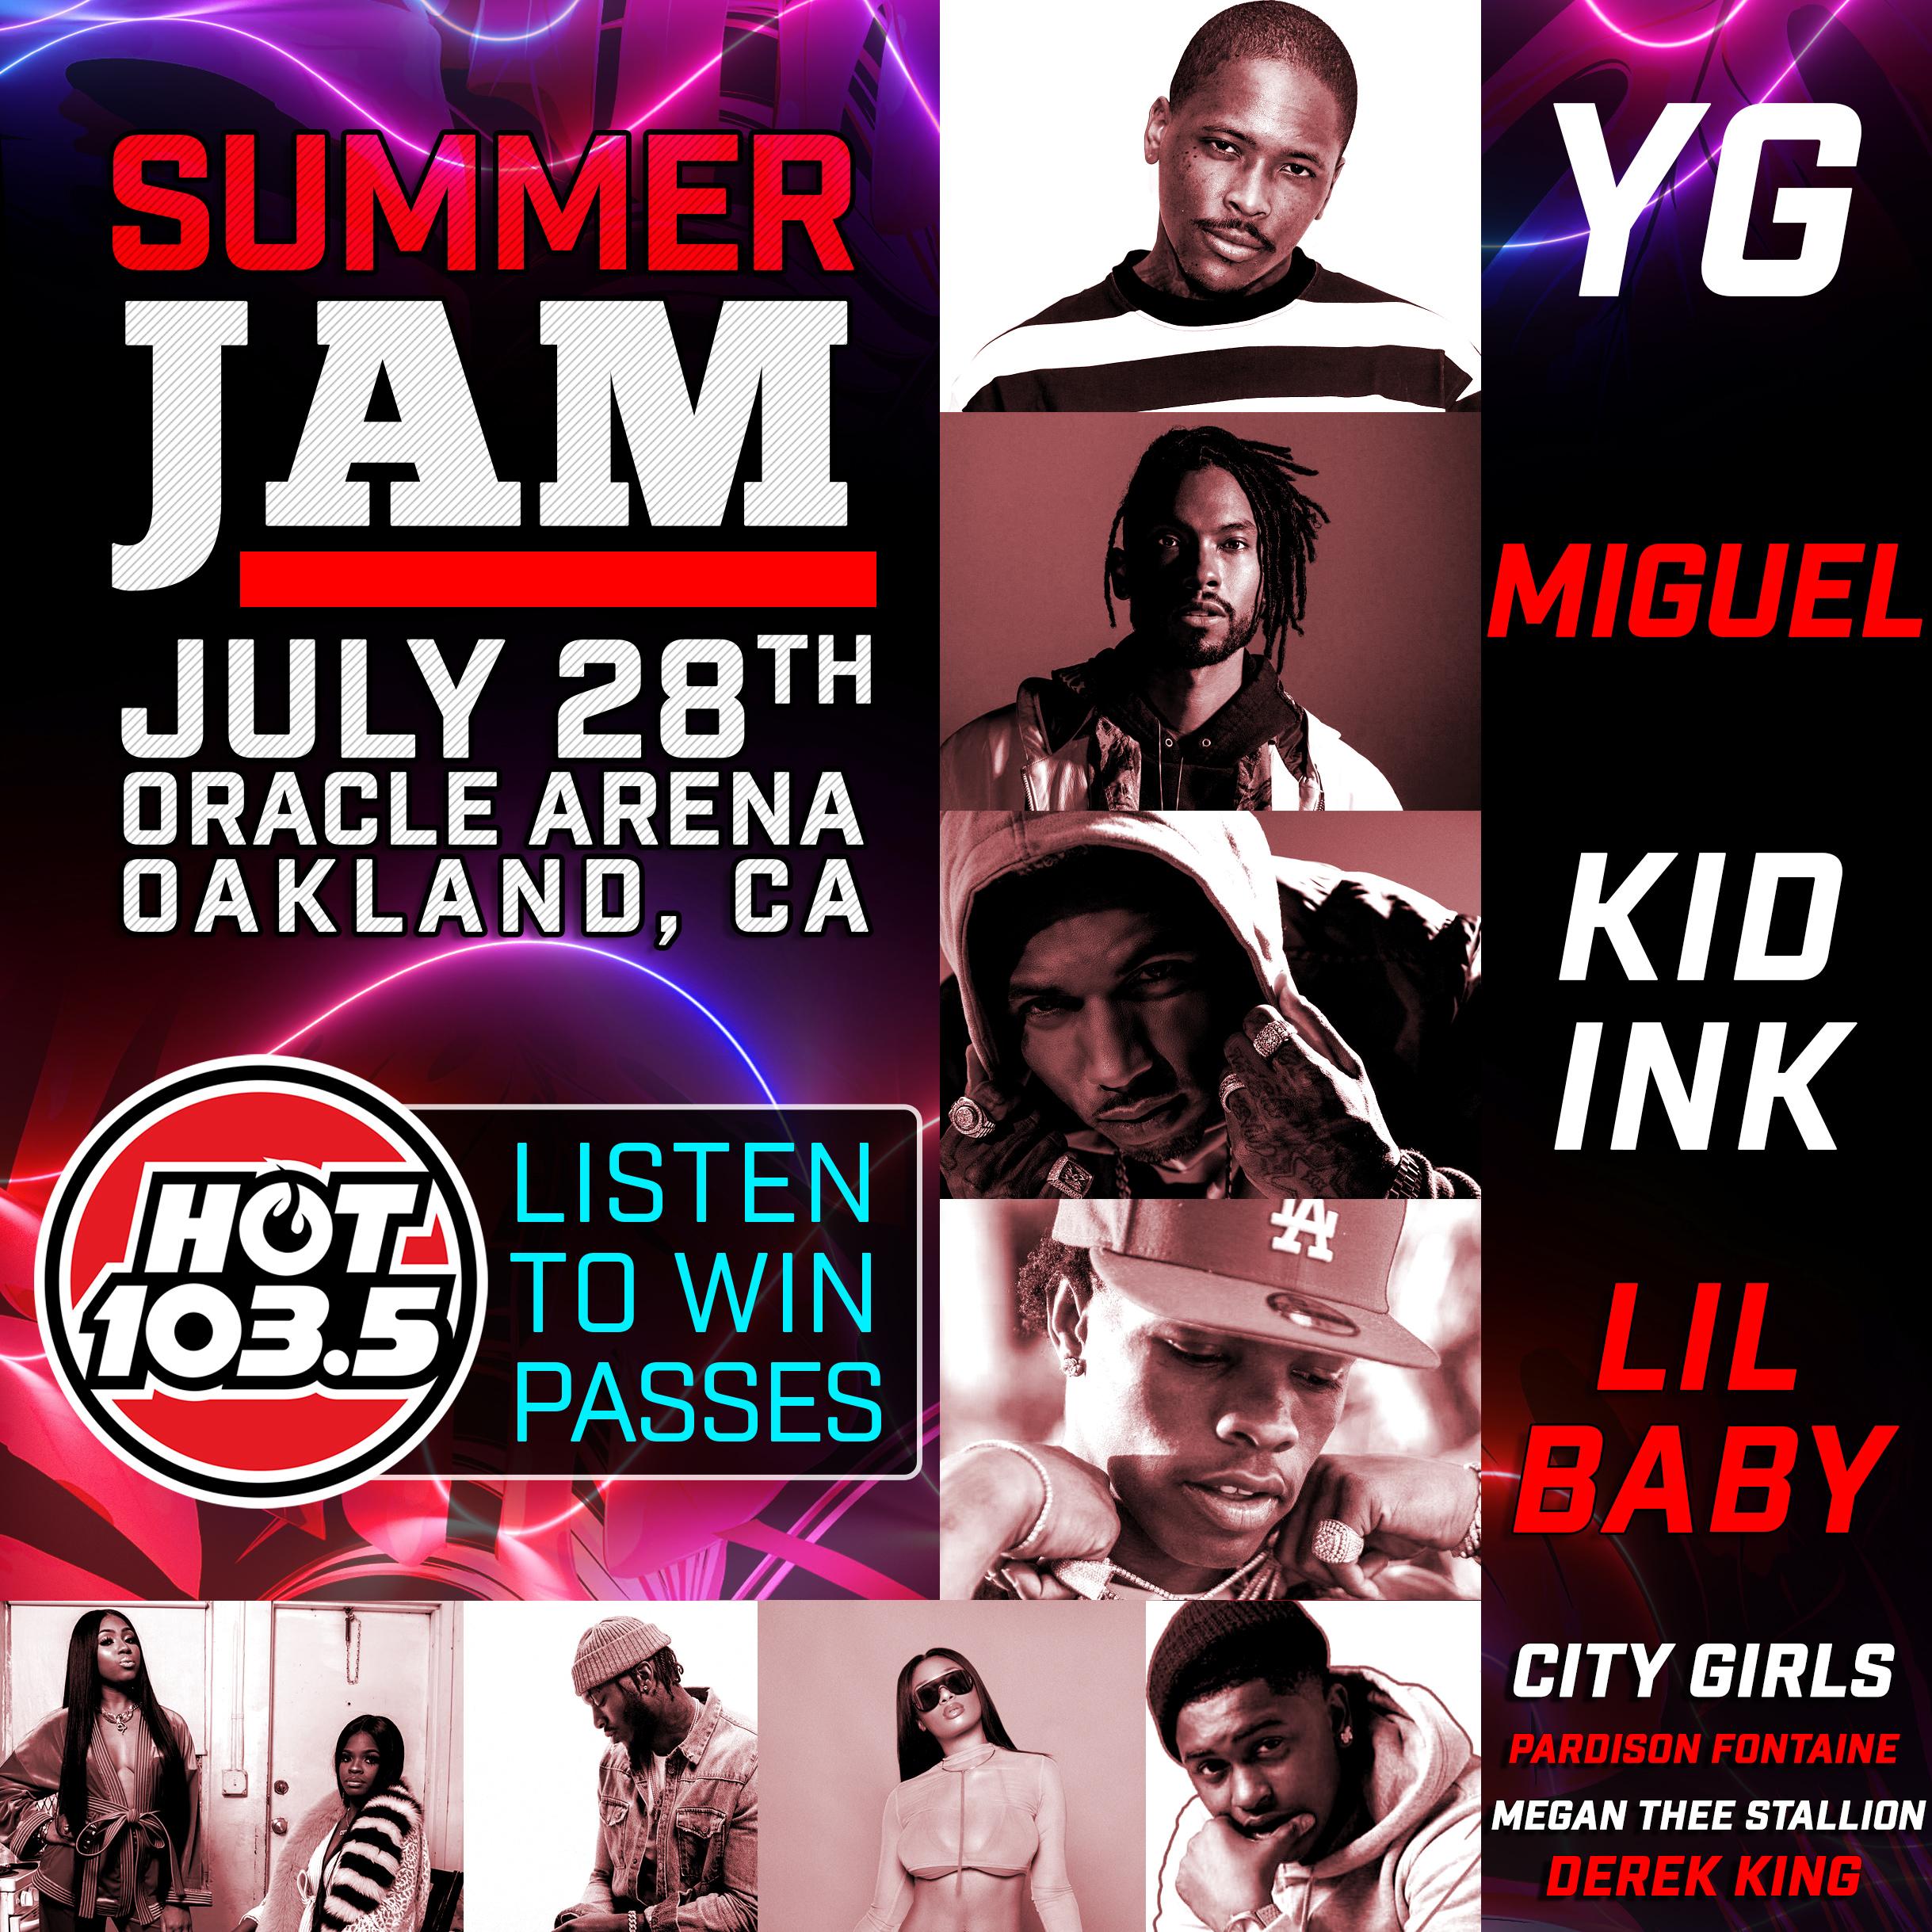 98pxy Summer Jam 2020.Summer Jam 2019 Tickets 15253 Videos Poll